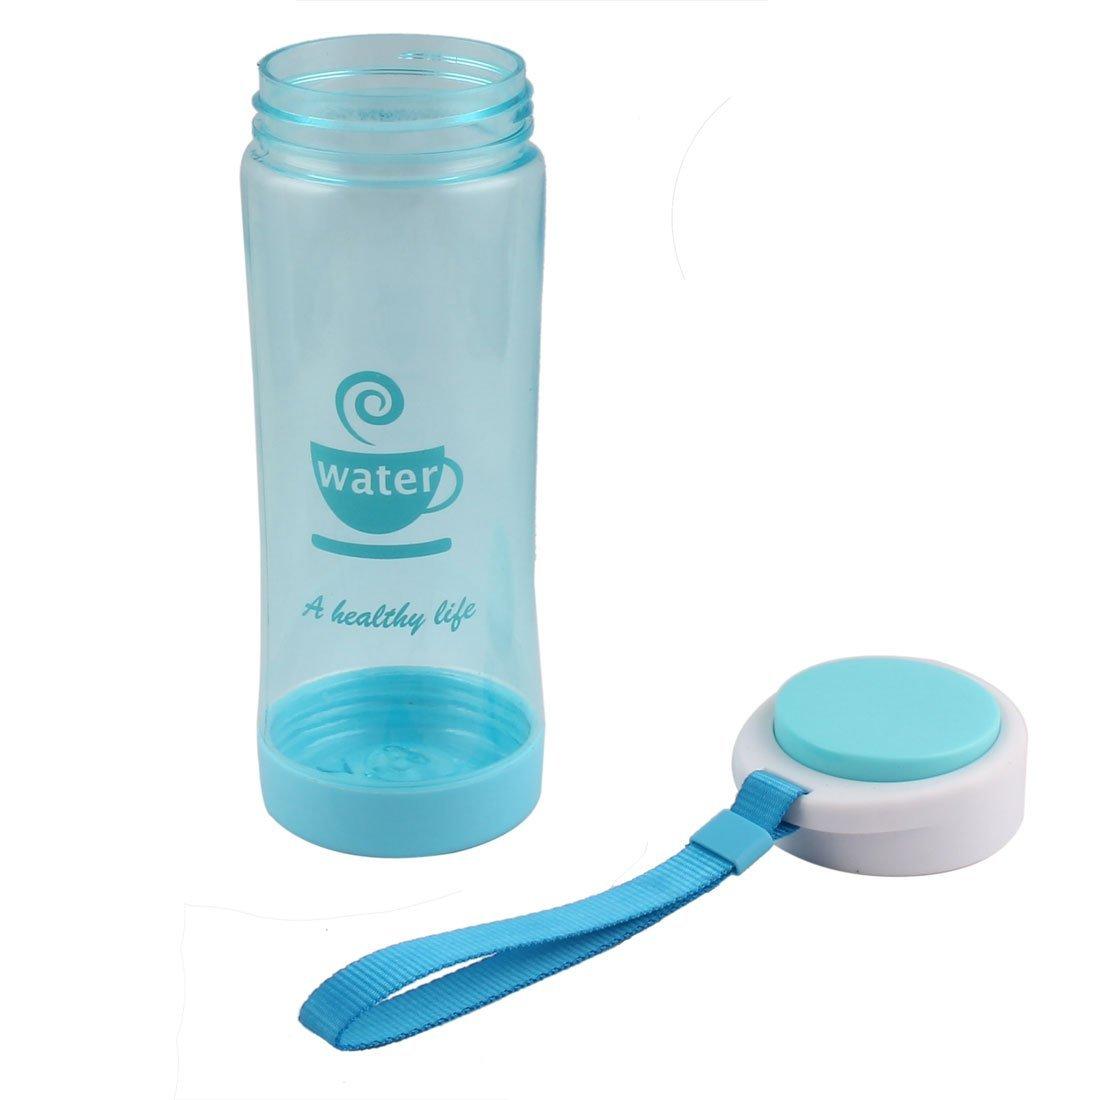 Amazon.com : eDealMax plástico Inicio Leche té Tamiz Deporte Beber Botella de agua la Taza de 500 ml Cian : Sports & Outdoors